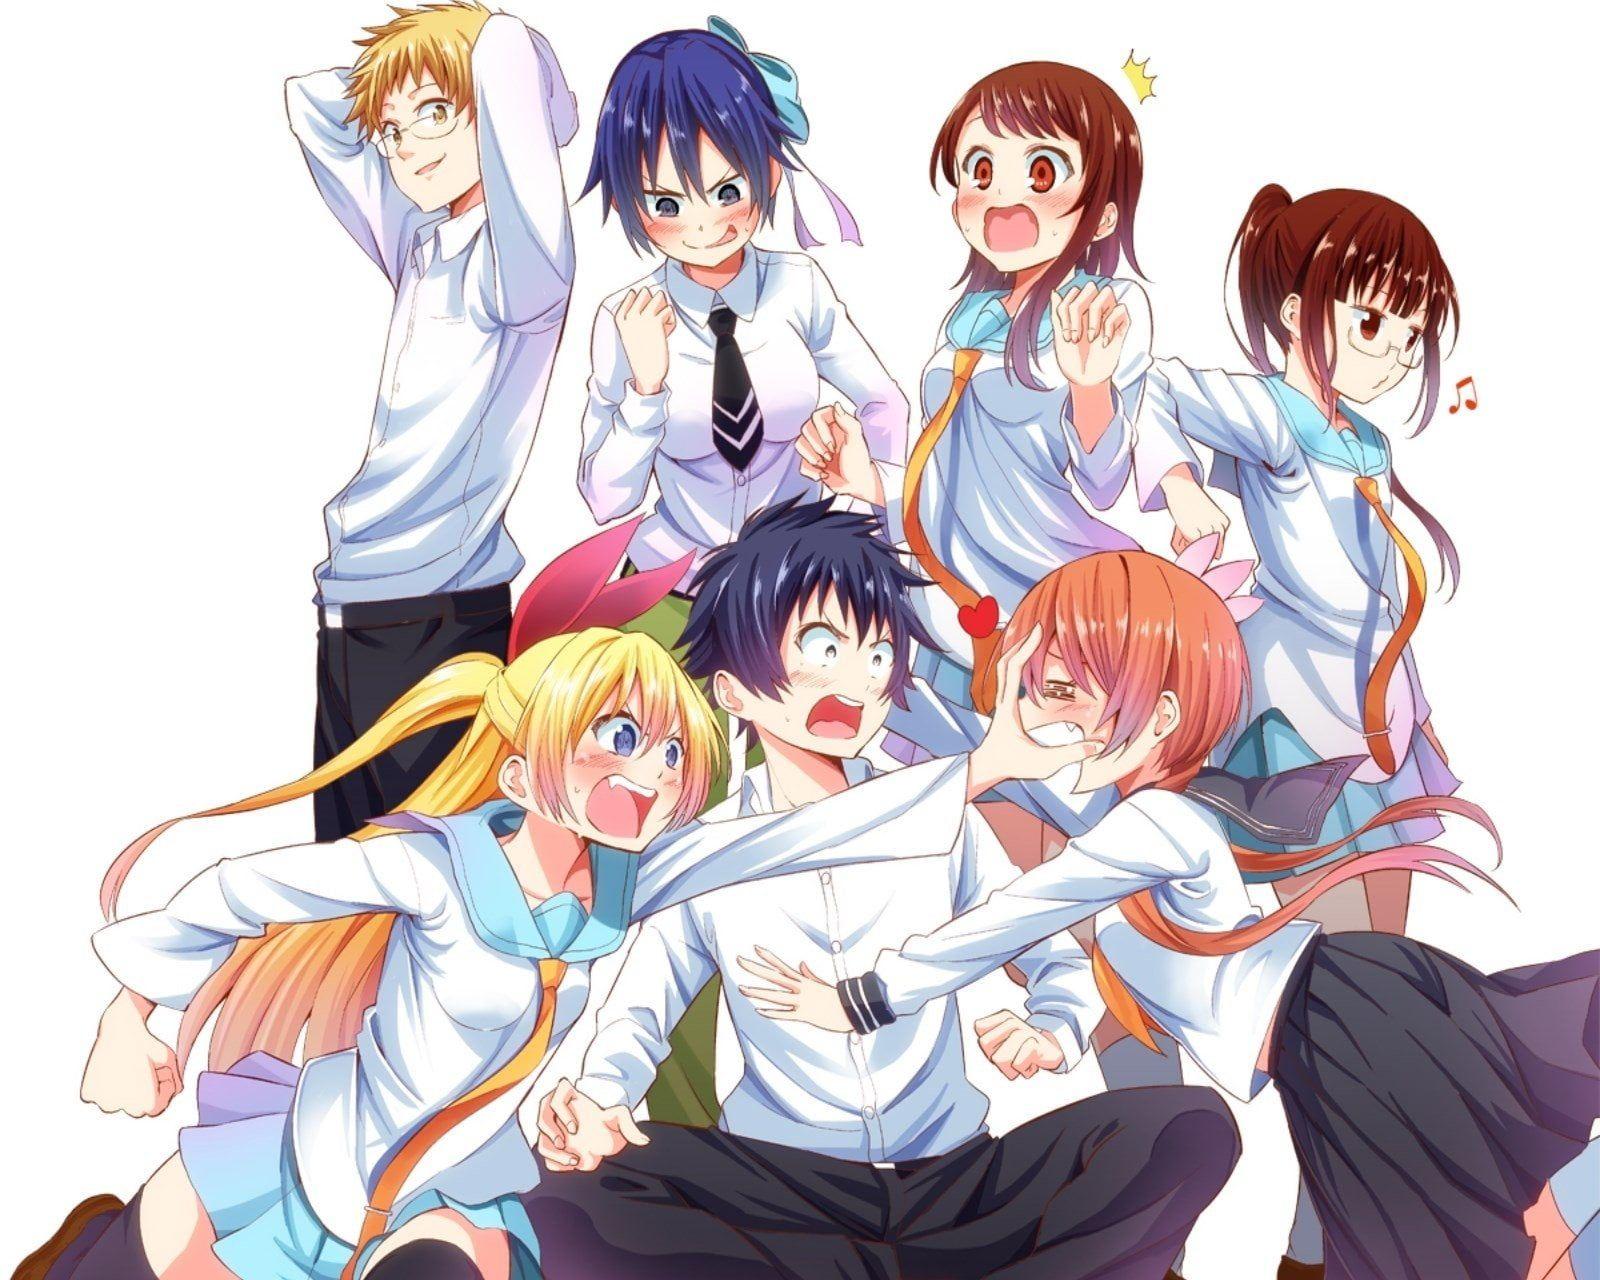 Nisekoi Wallpaper Anime Nisekoi Chitoge Kirisaki Kosaki Onodera Marika Tachibana Raku Ichijō Ruri Miyamoto Seishirou ร กลวงป วนใจ ต วละครจากการ ต น ภาพประกอบ